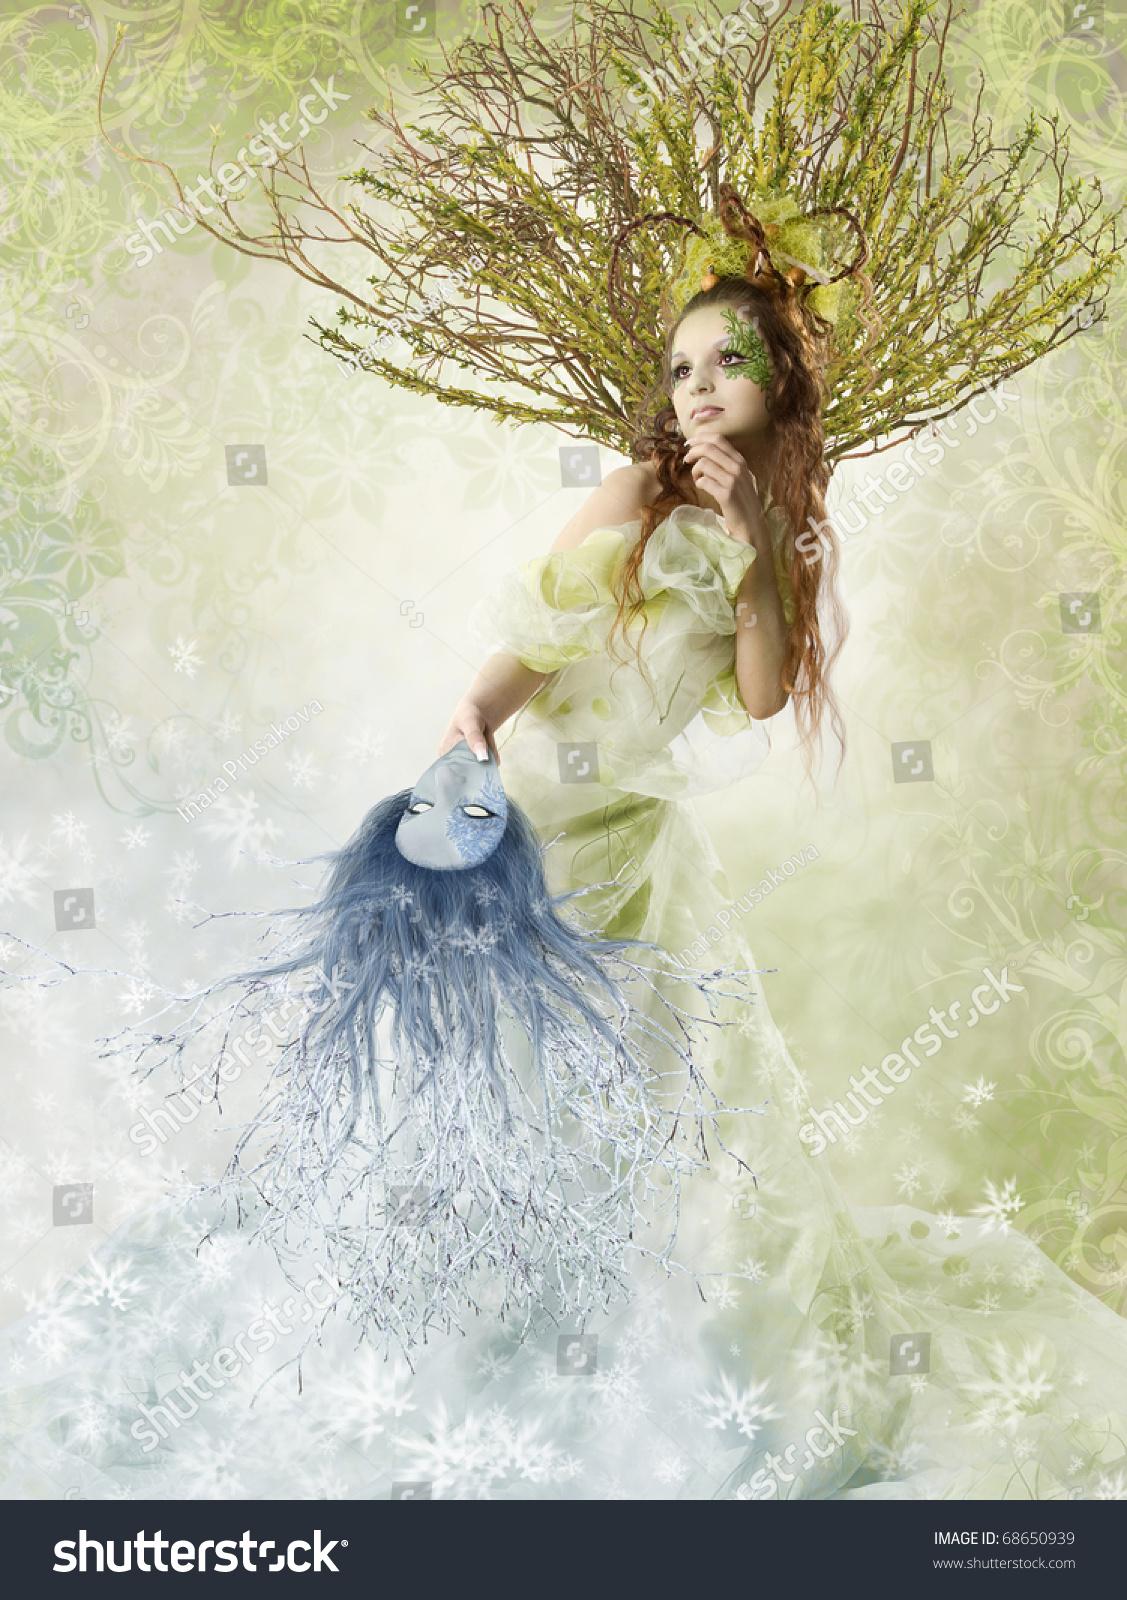 Fantasy Fashion Woman Holding Winter Spring Stock Photo 68650939 Shutterstock